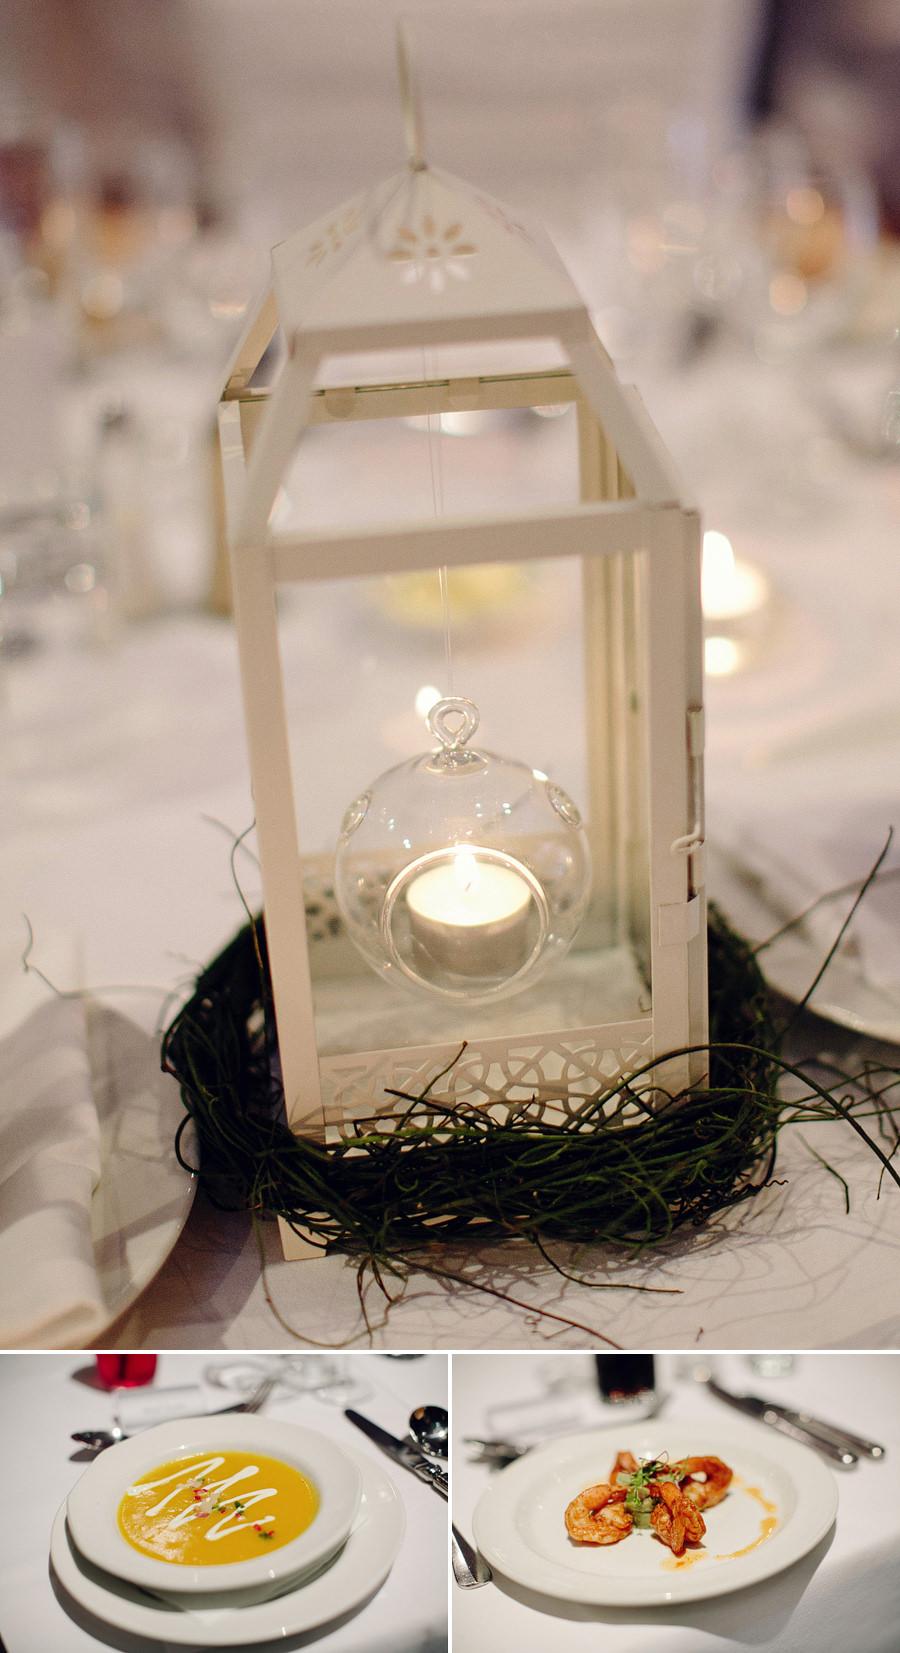 Sebel Gazebo Wedding Photography: Reception Details